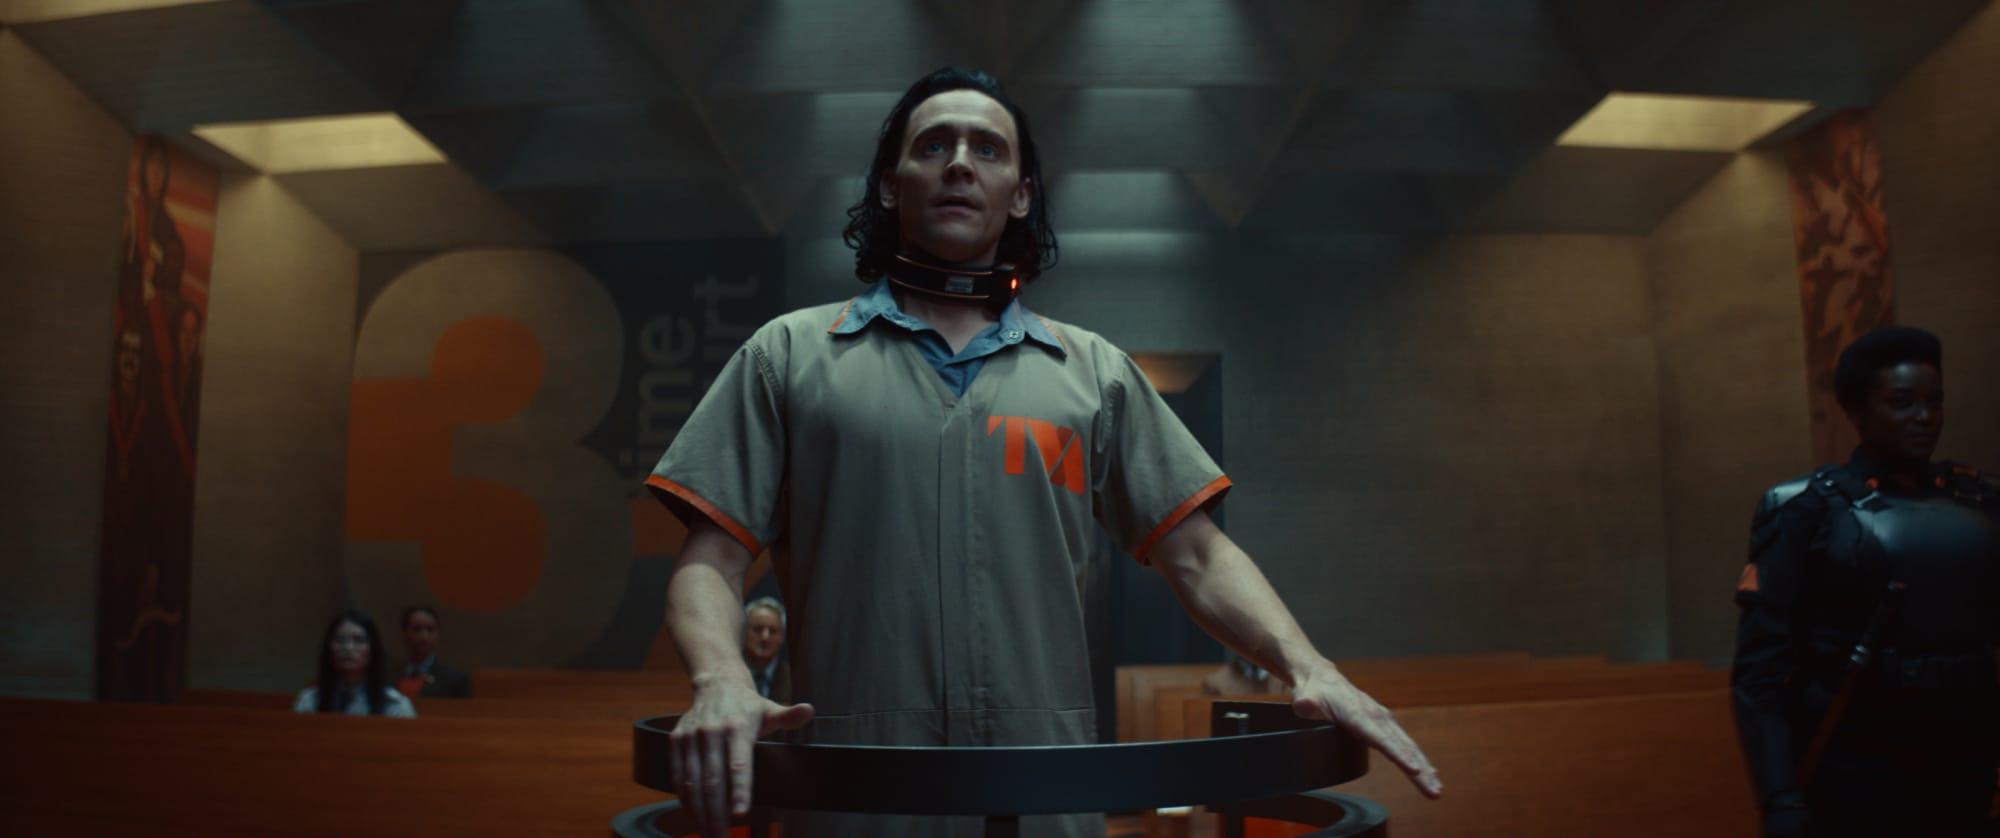 Marvel's Loki director confirms that the god of mischief is genderfluid